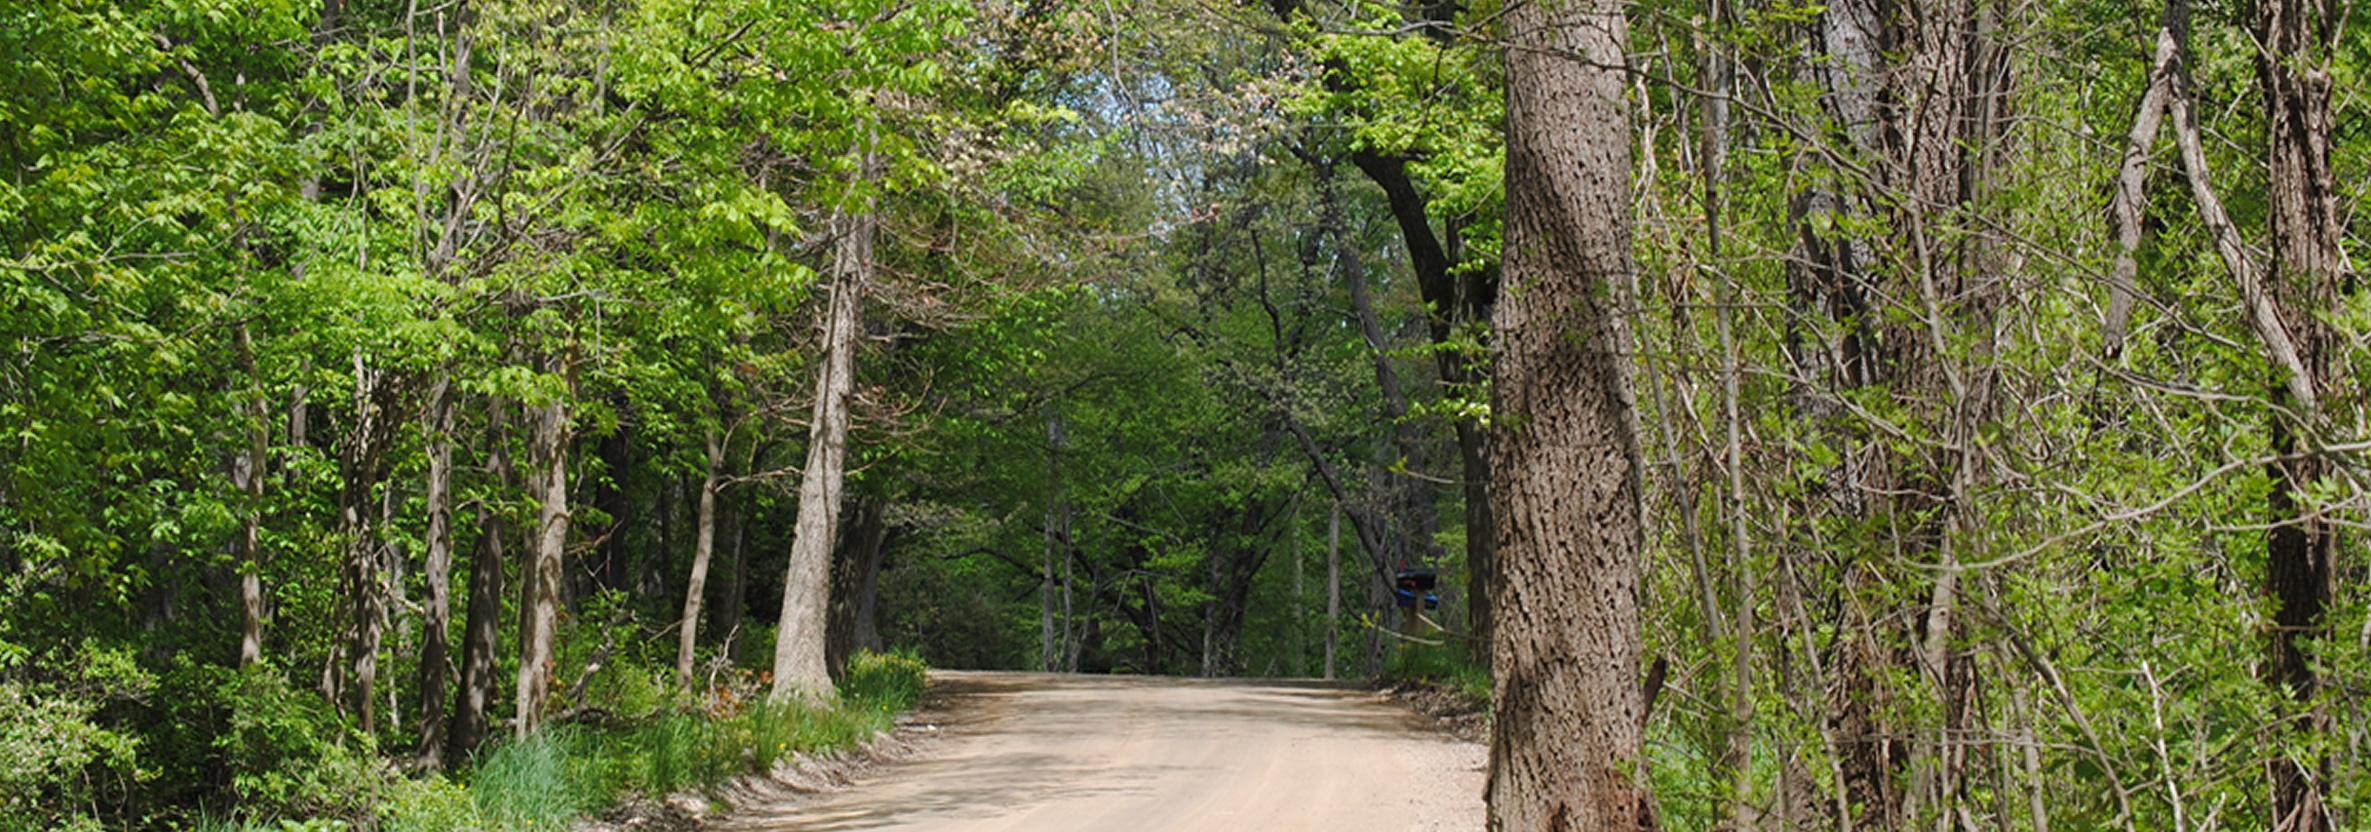 Michigan oakland county highland -  Highland Township Dirt Road Jpg